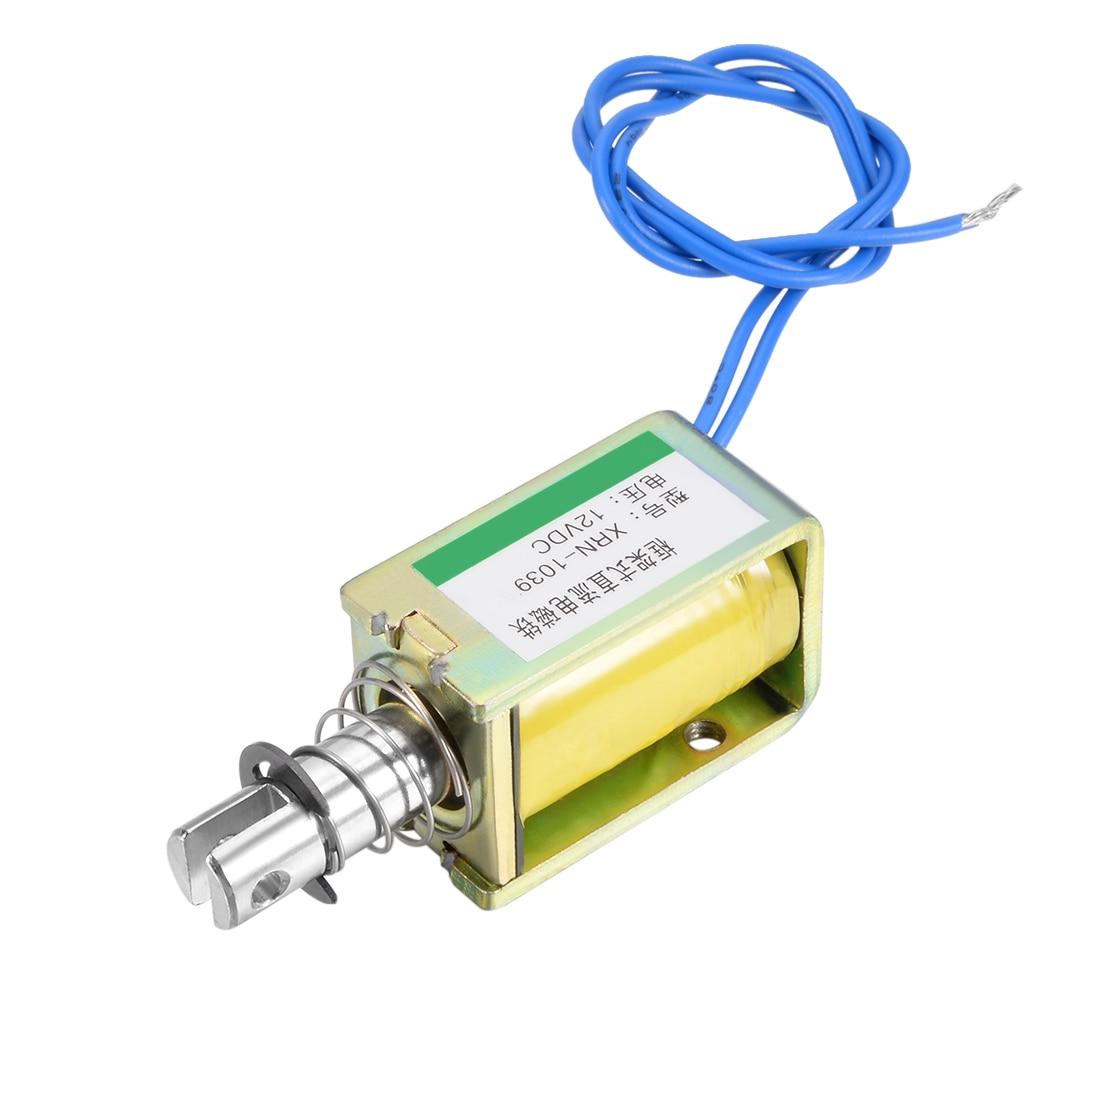 Uxcell XRN-1039 DC 12V 25N 10mm Pull Type Open Frame Solenoid Electromagnet